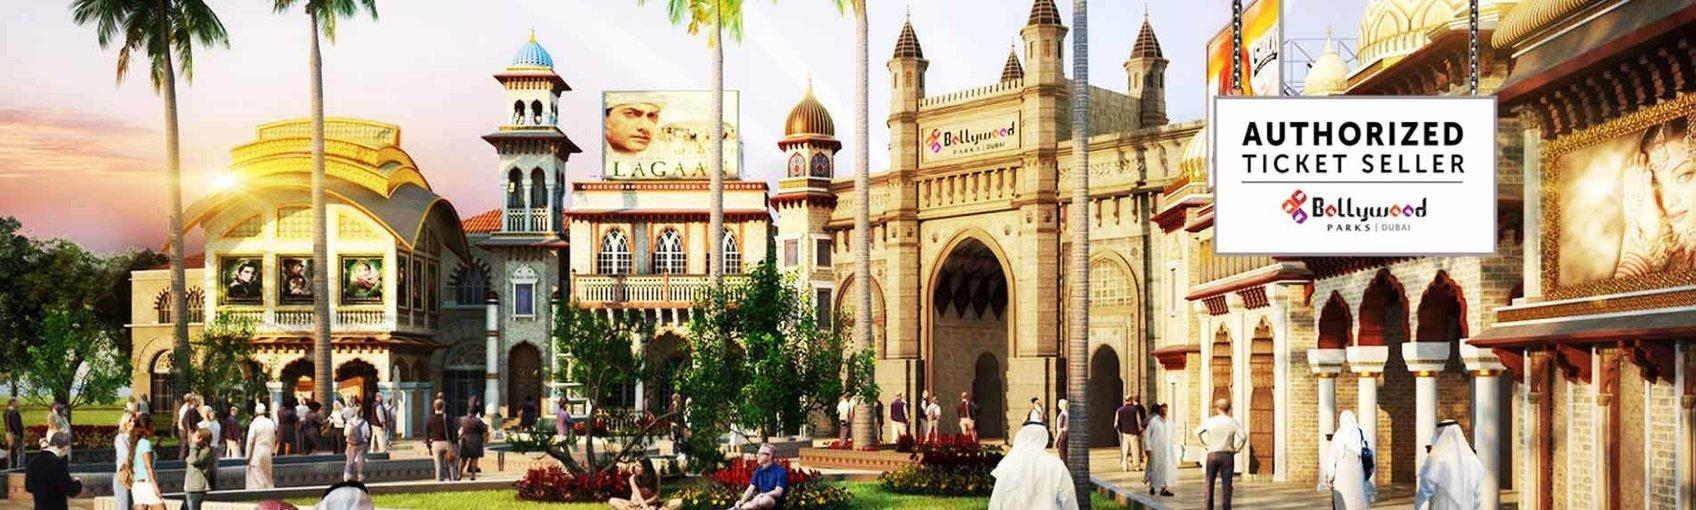 Bollywood Parks Dubai Ticket - Tour